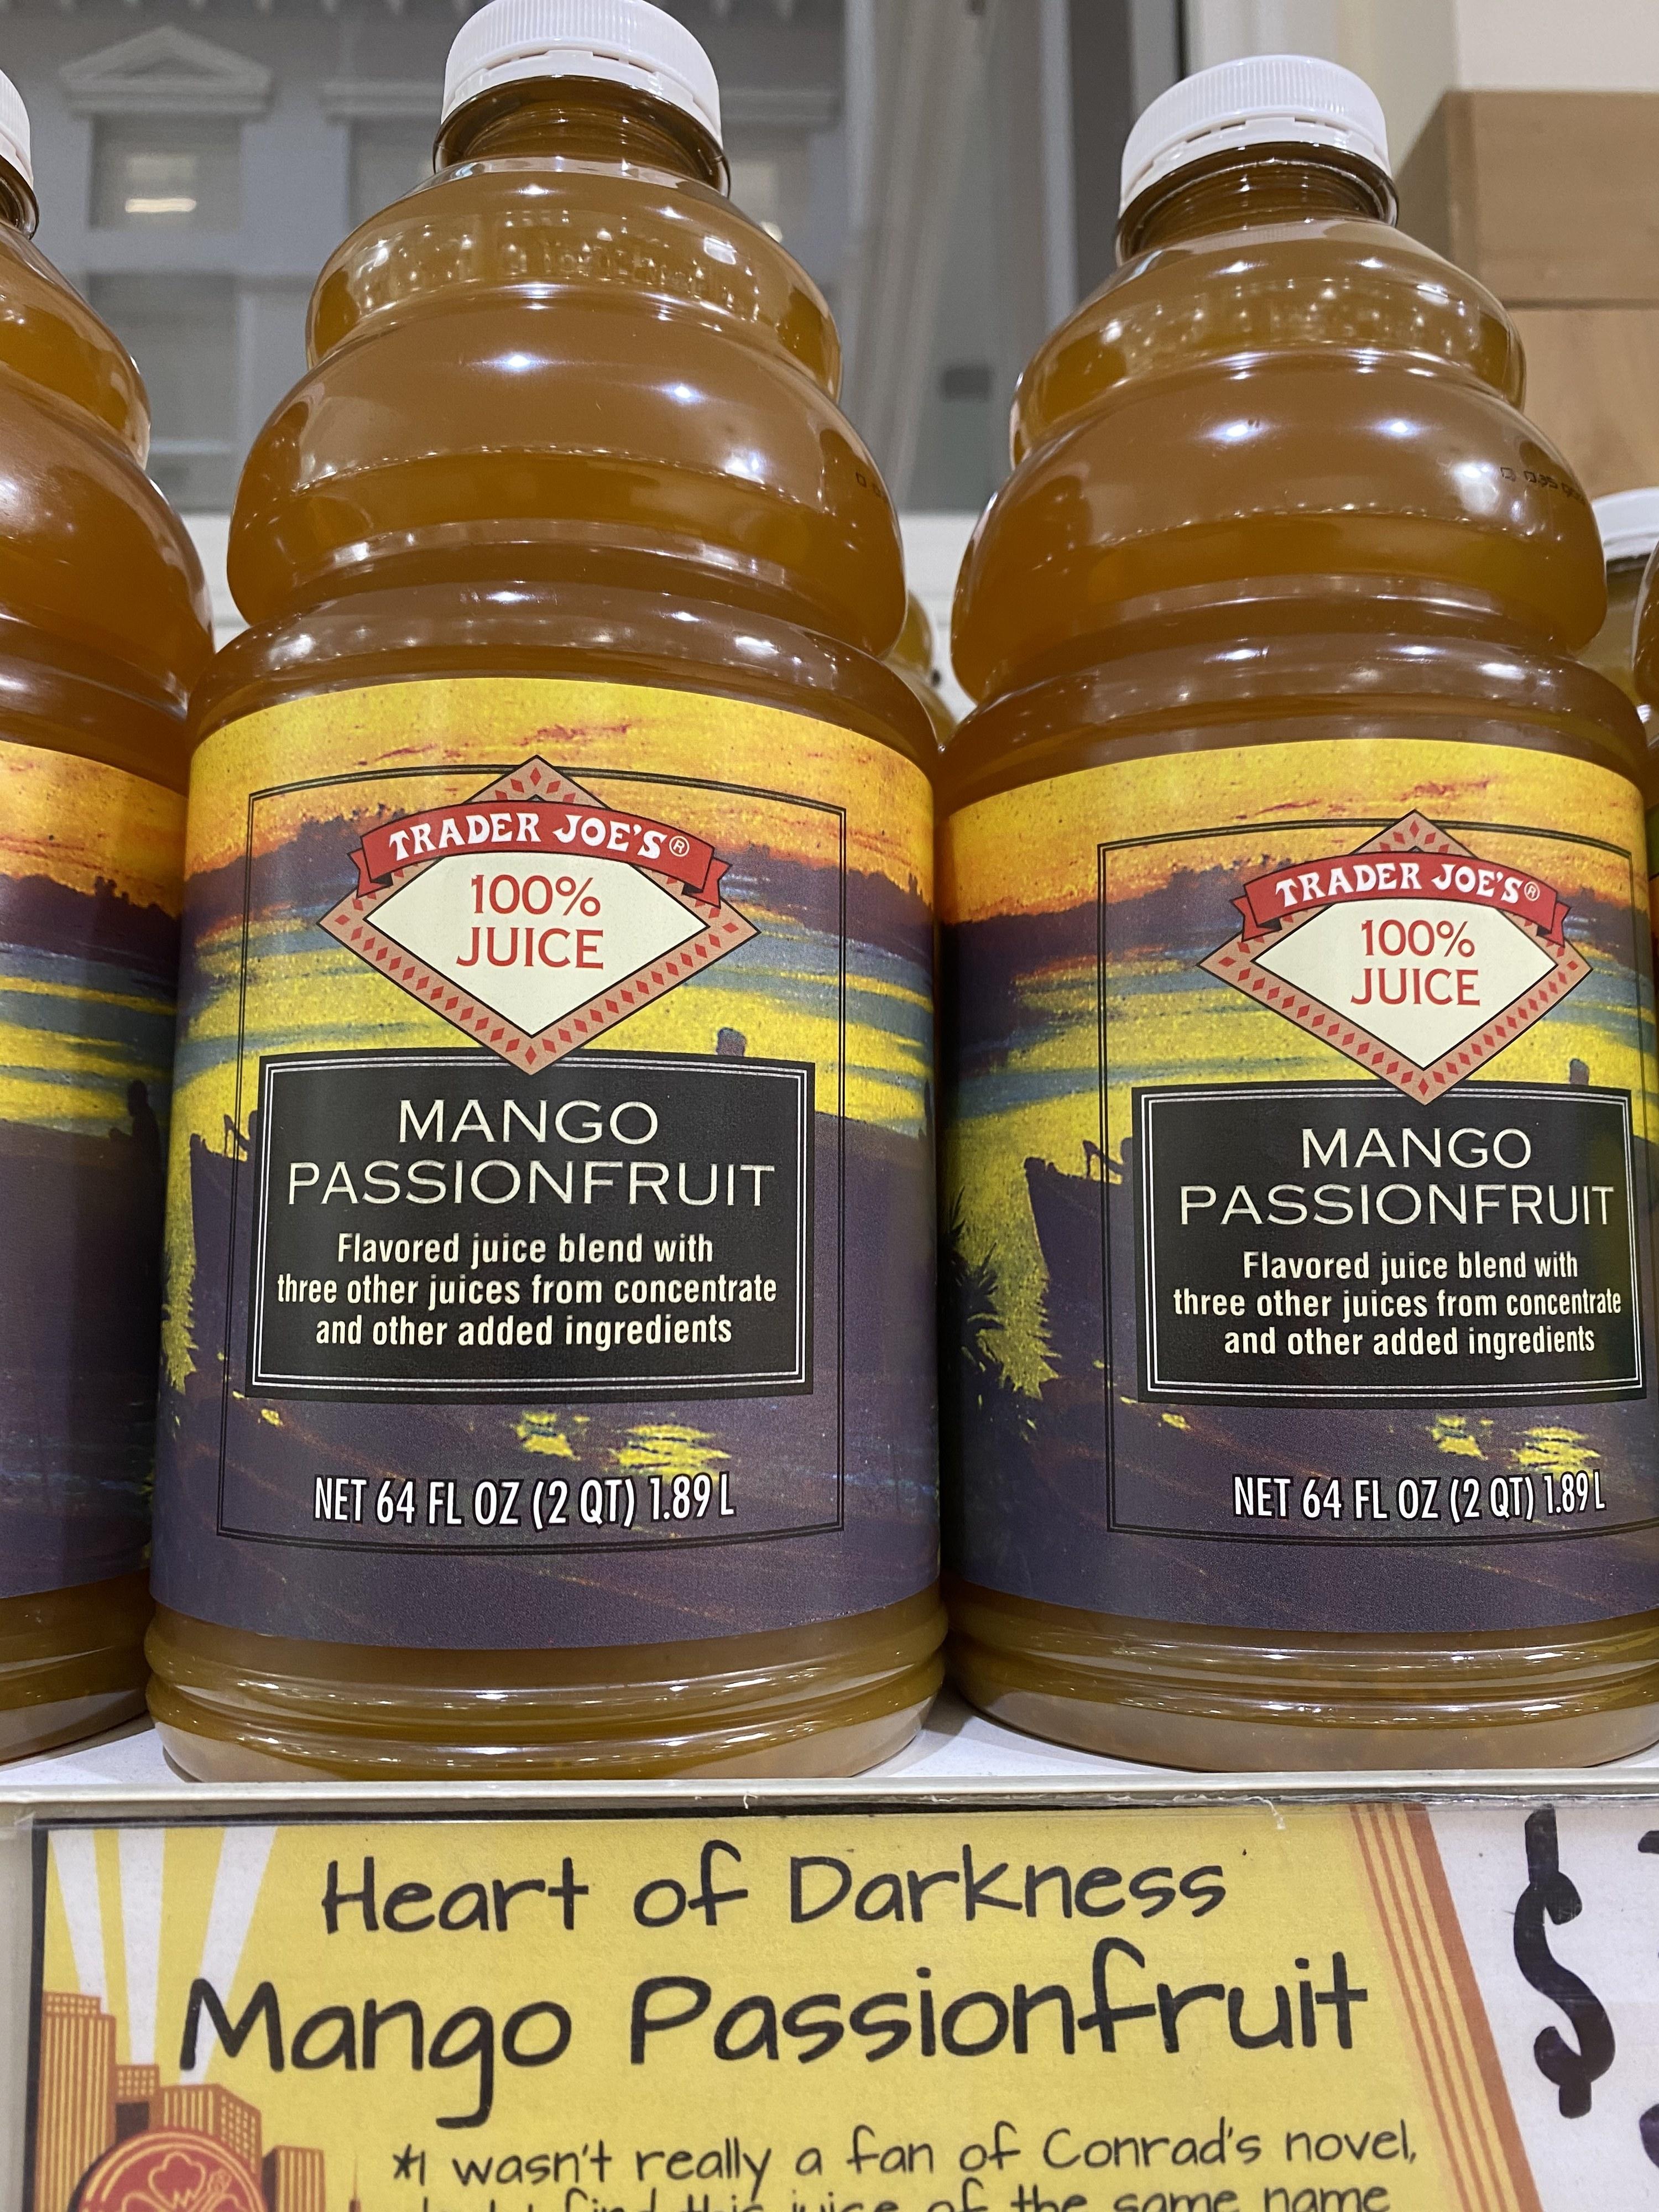 Mango passionfruit juice from Trader Joe's.